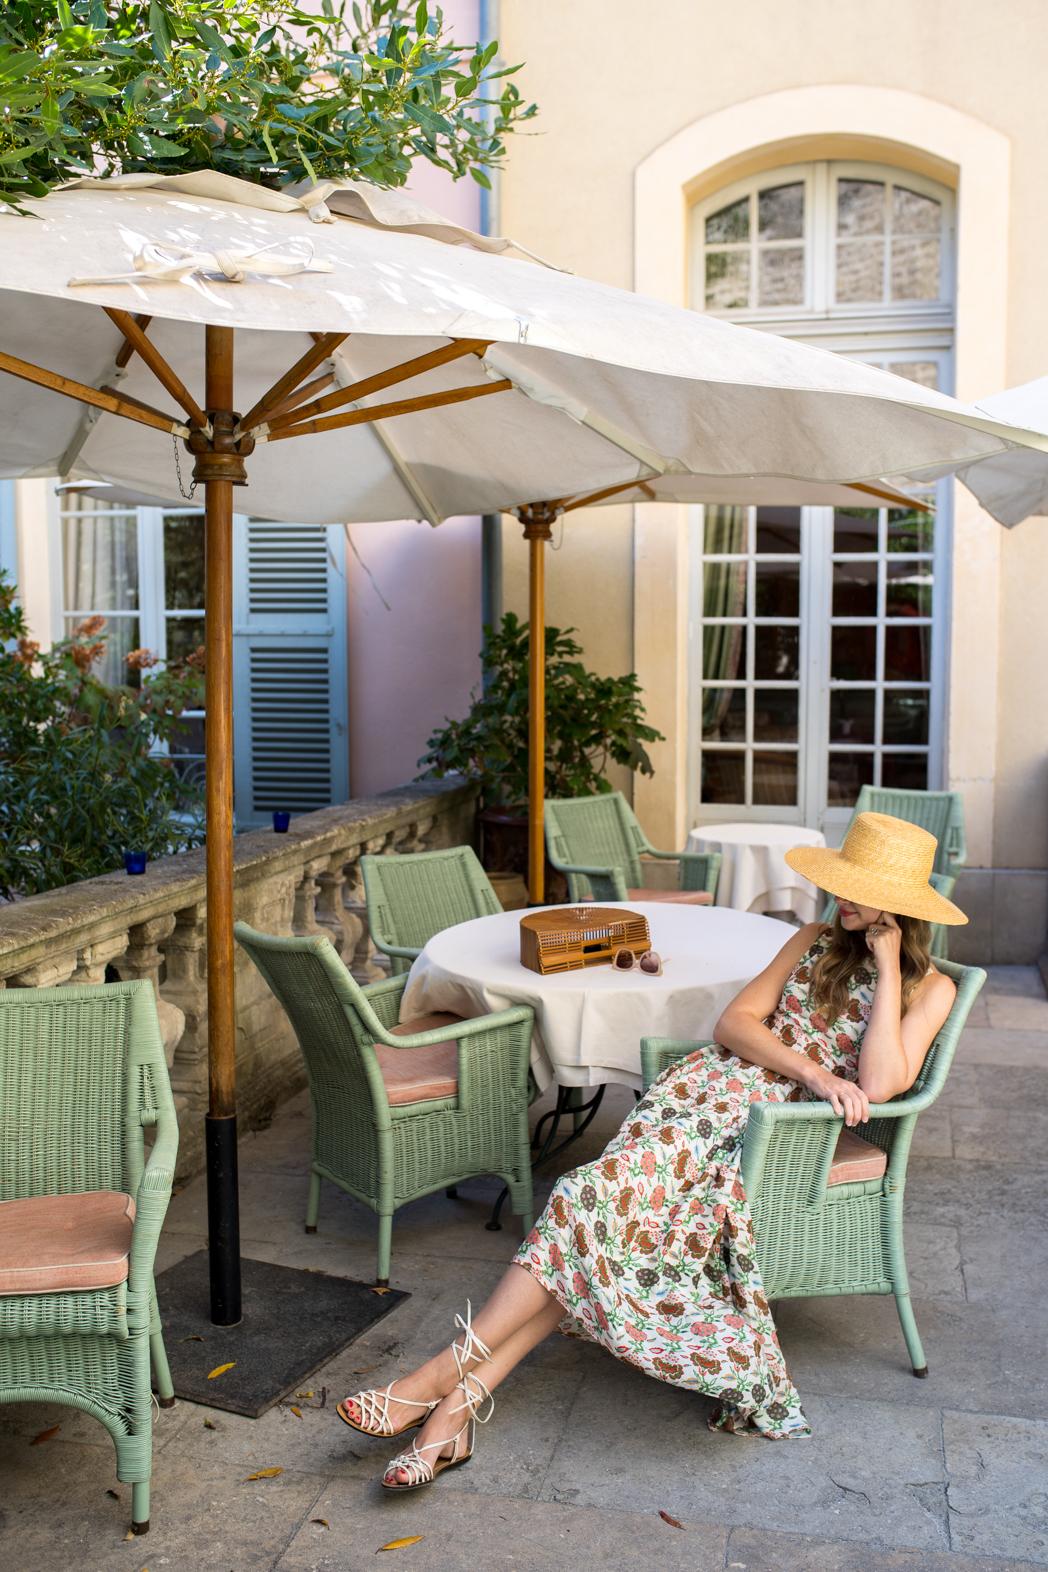 Stacie Flinner La Mirande Avignon-3.jpg